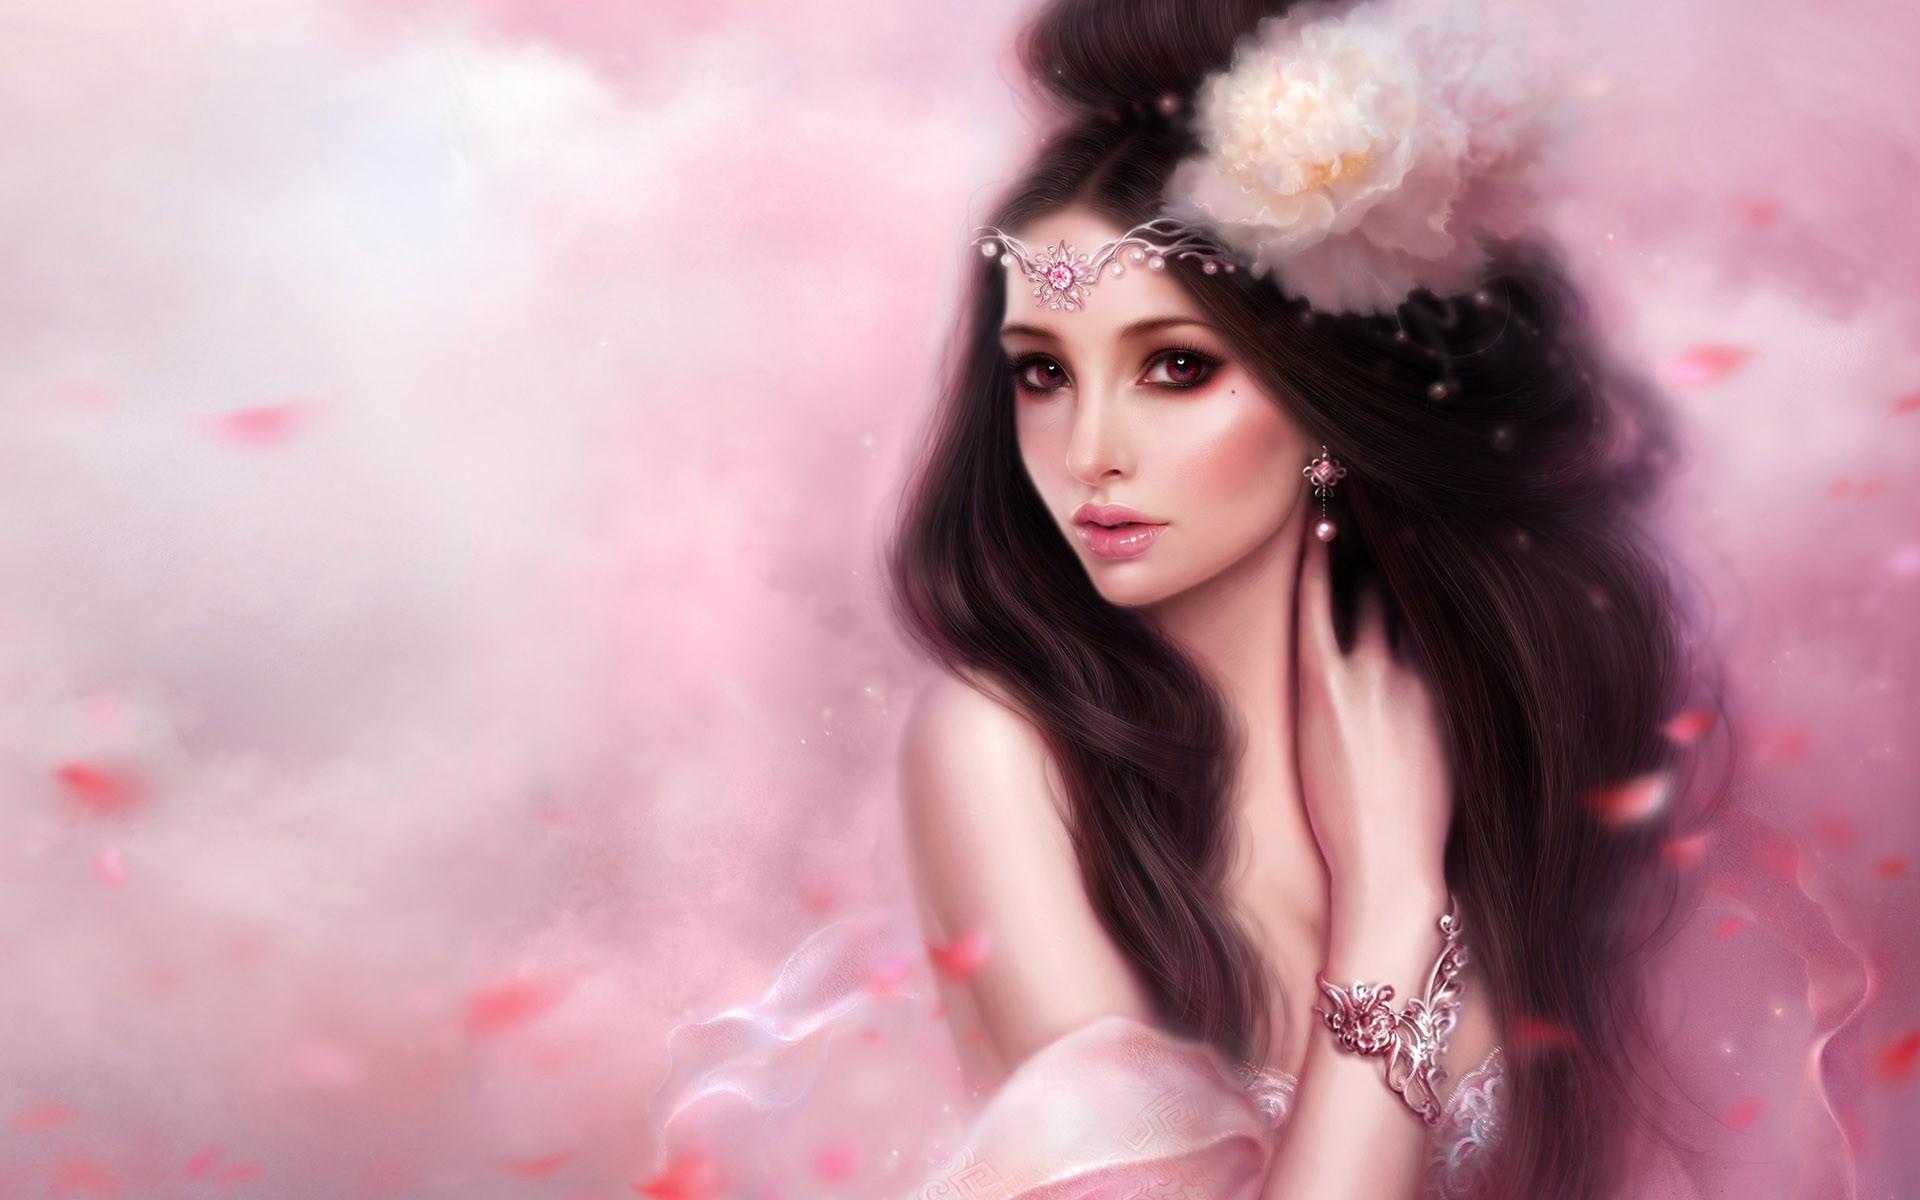 Fantasy Beauty Girl Wallpaper Images Photos #mgfhf12c